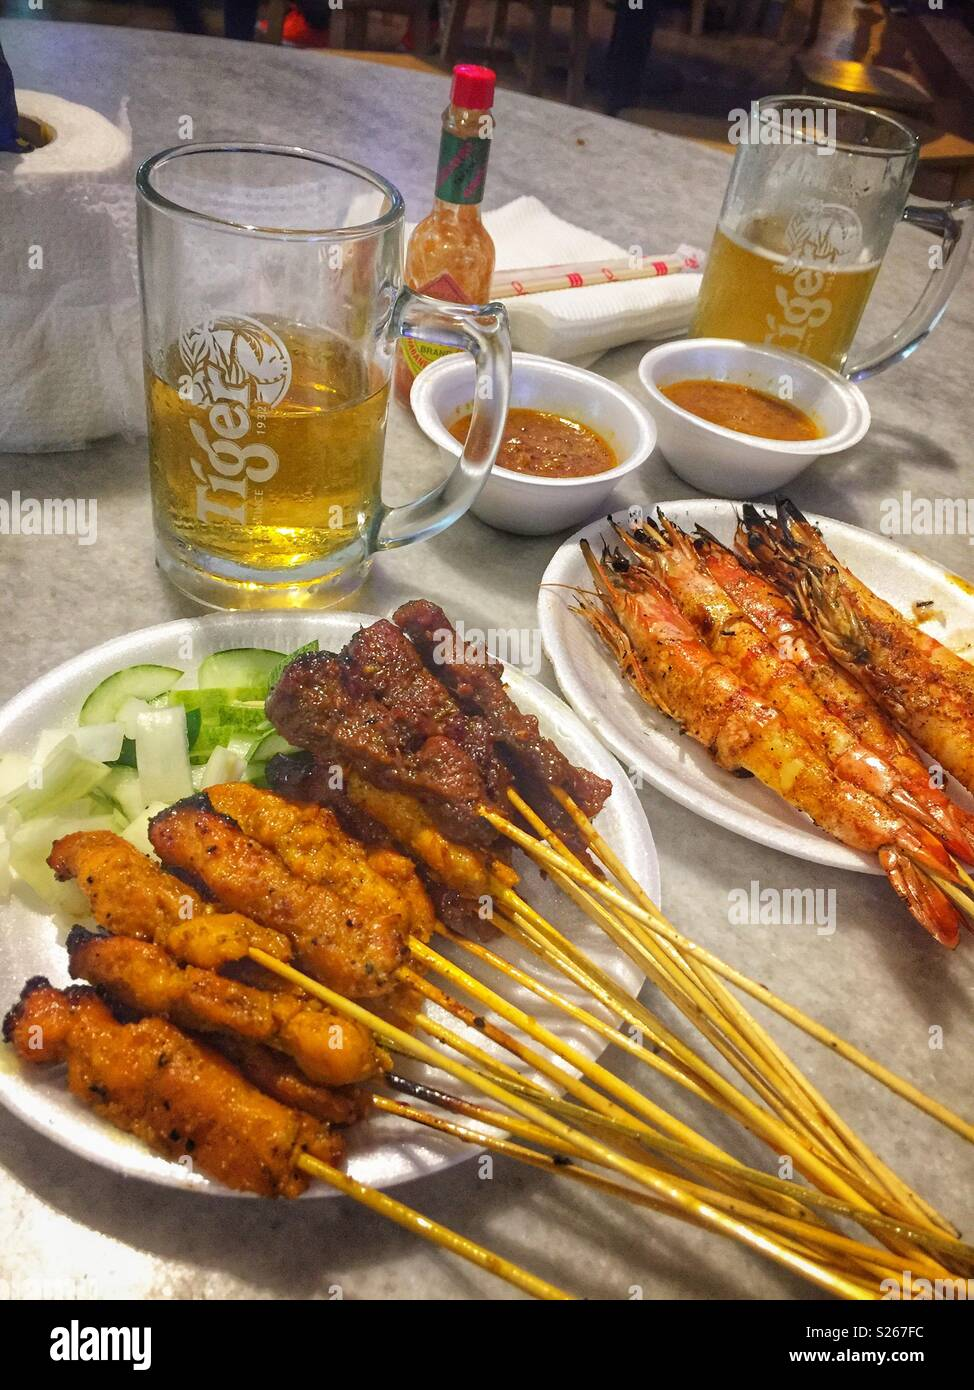 Satay and Tiger beer - dinner at Lau Pa Sat (Telok Ayer Food Market), Singapore - Stock Image